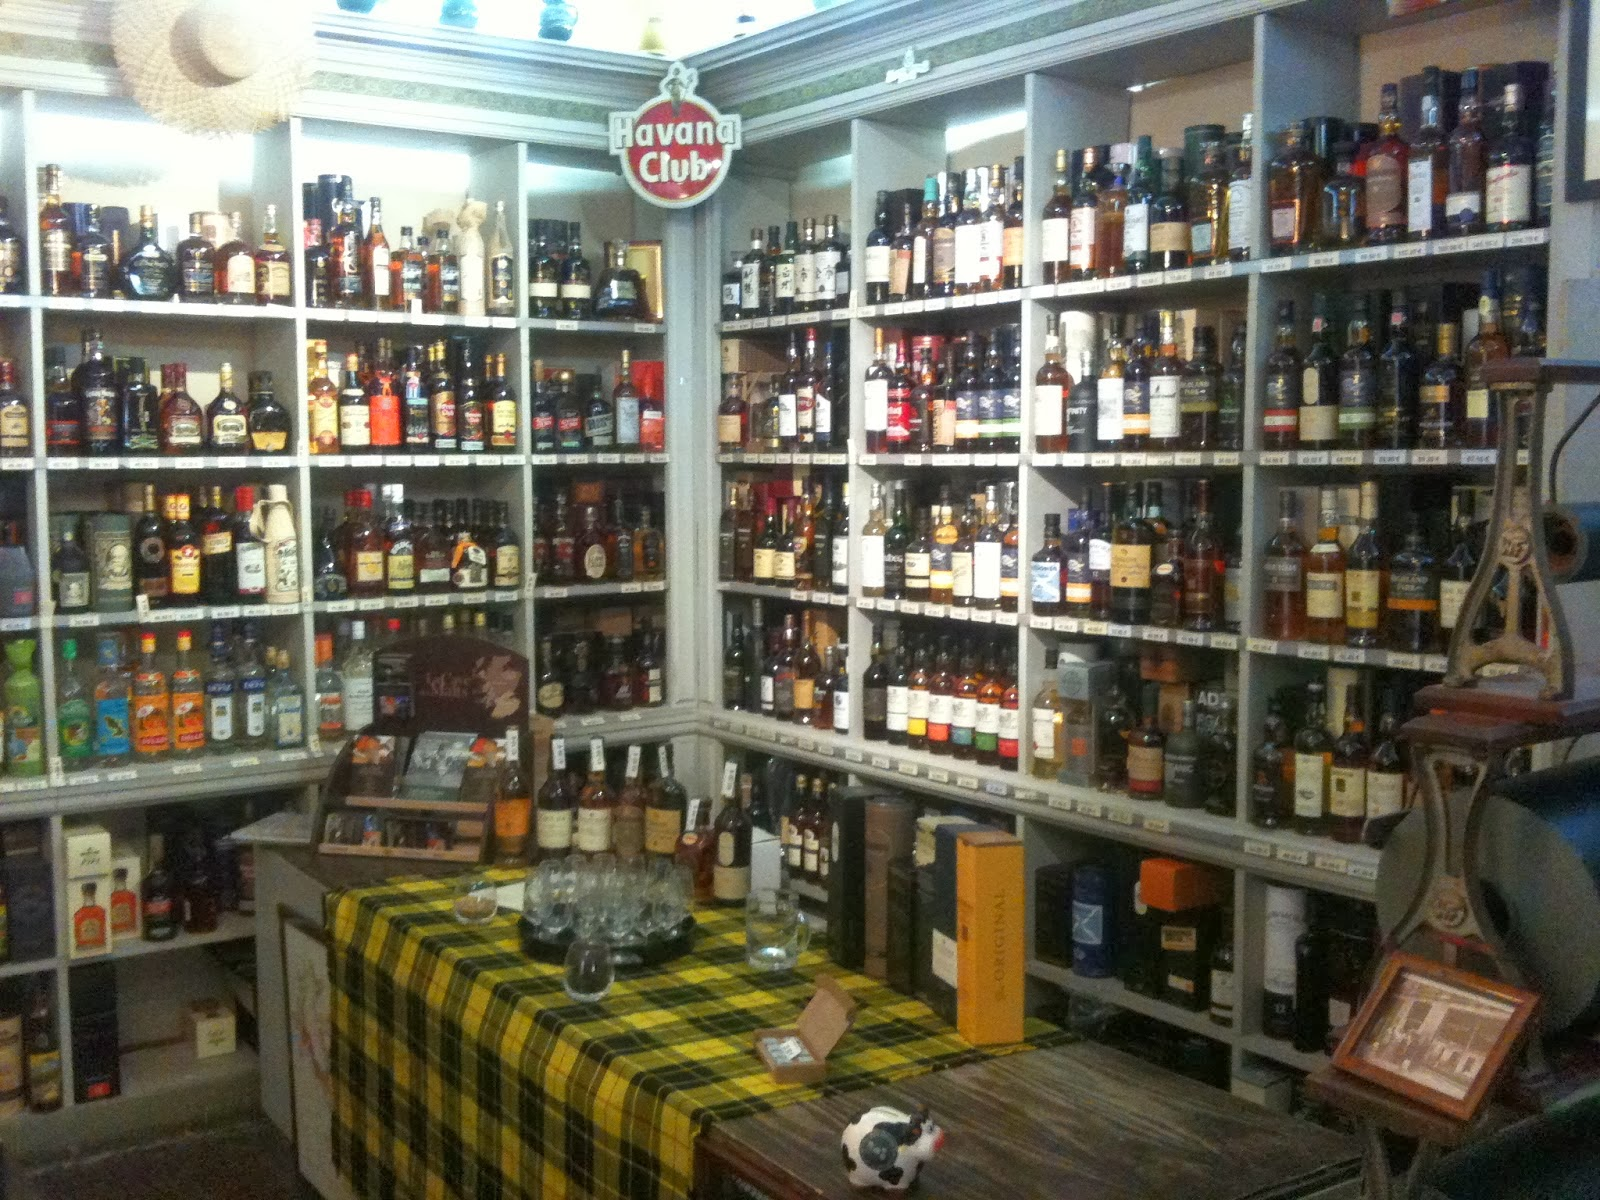 aux grands vins de france la plus grande cave whisky du languedoc est montpellier. Black Bedroom Furniture Sets. Home Design Ideas